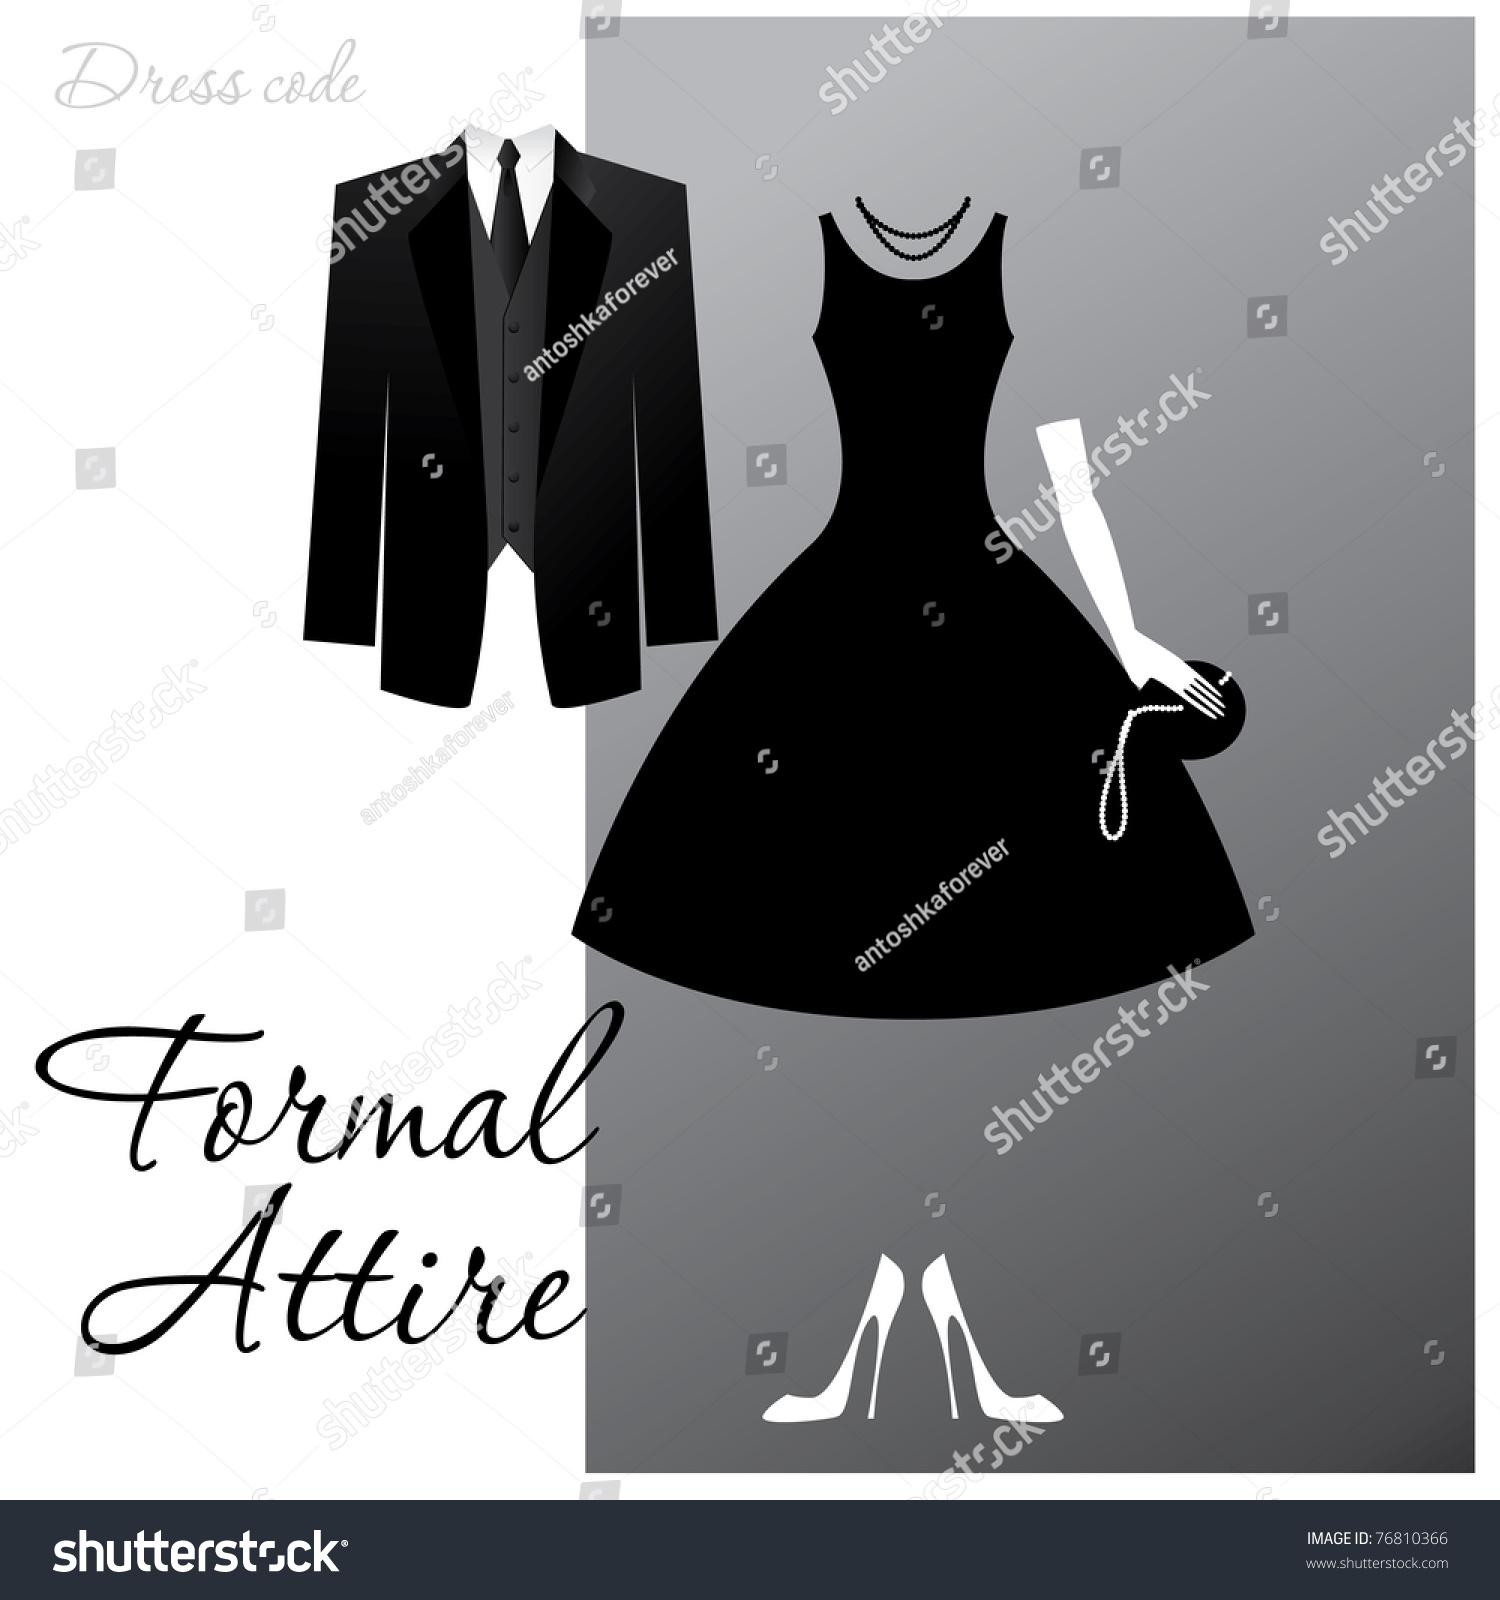 Dress Code Formal Attire Man Black Stock-vektorgrafik 76810366 ...